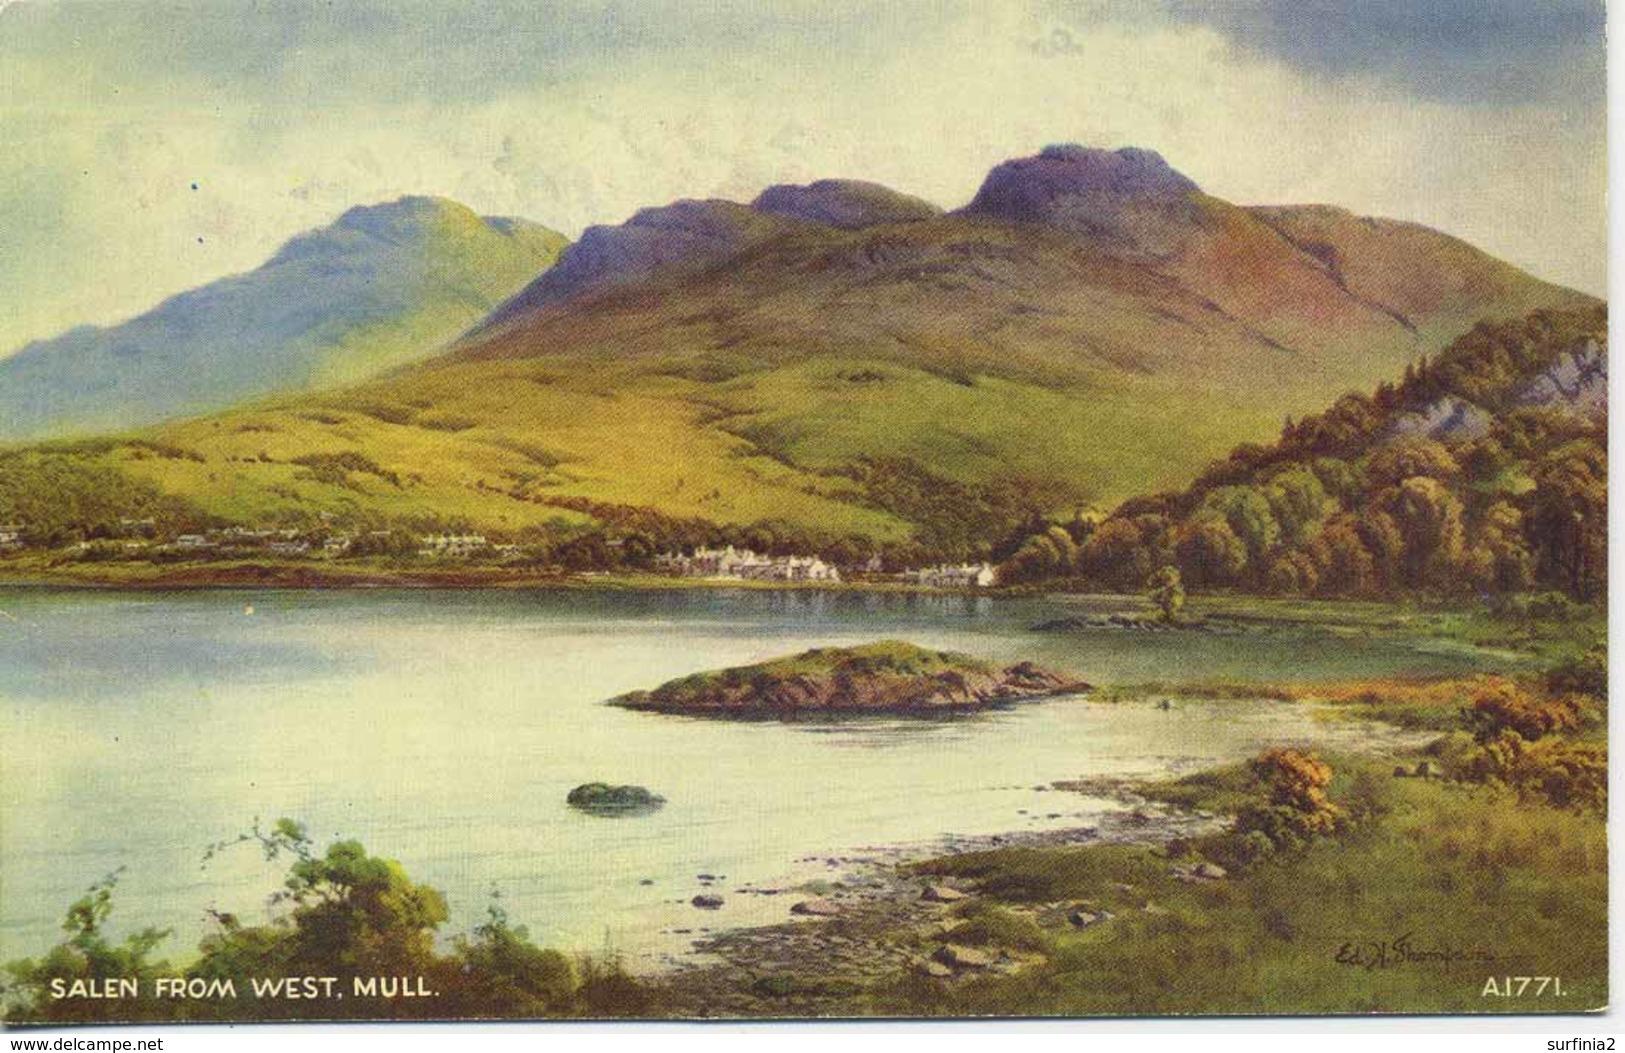 VALENTINES ART  A1771 - SALEN FROM WEST, MULL - E H THOMPSON - Argyllshire